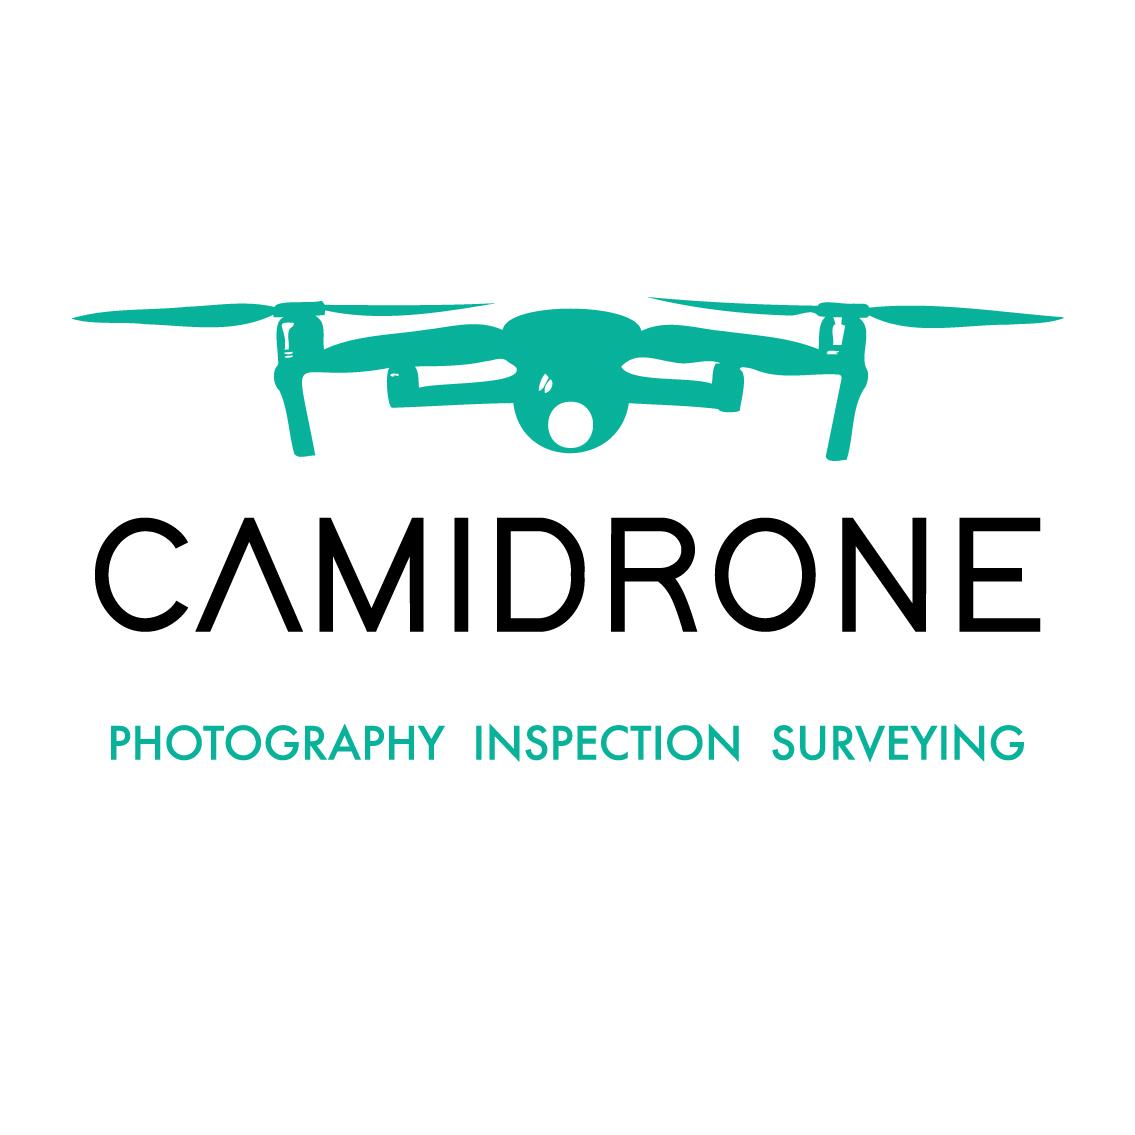 Camidrone Ltd.